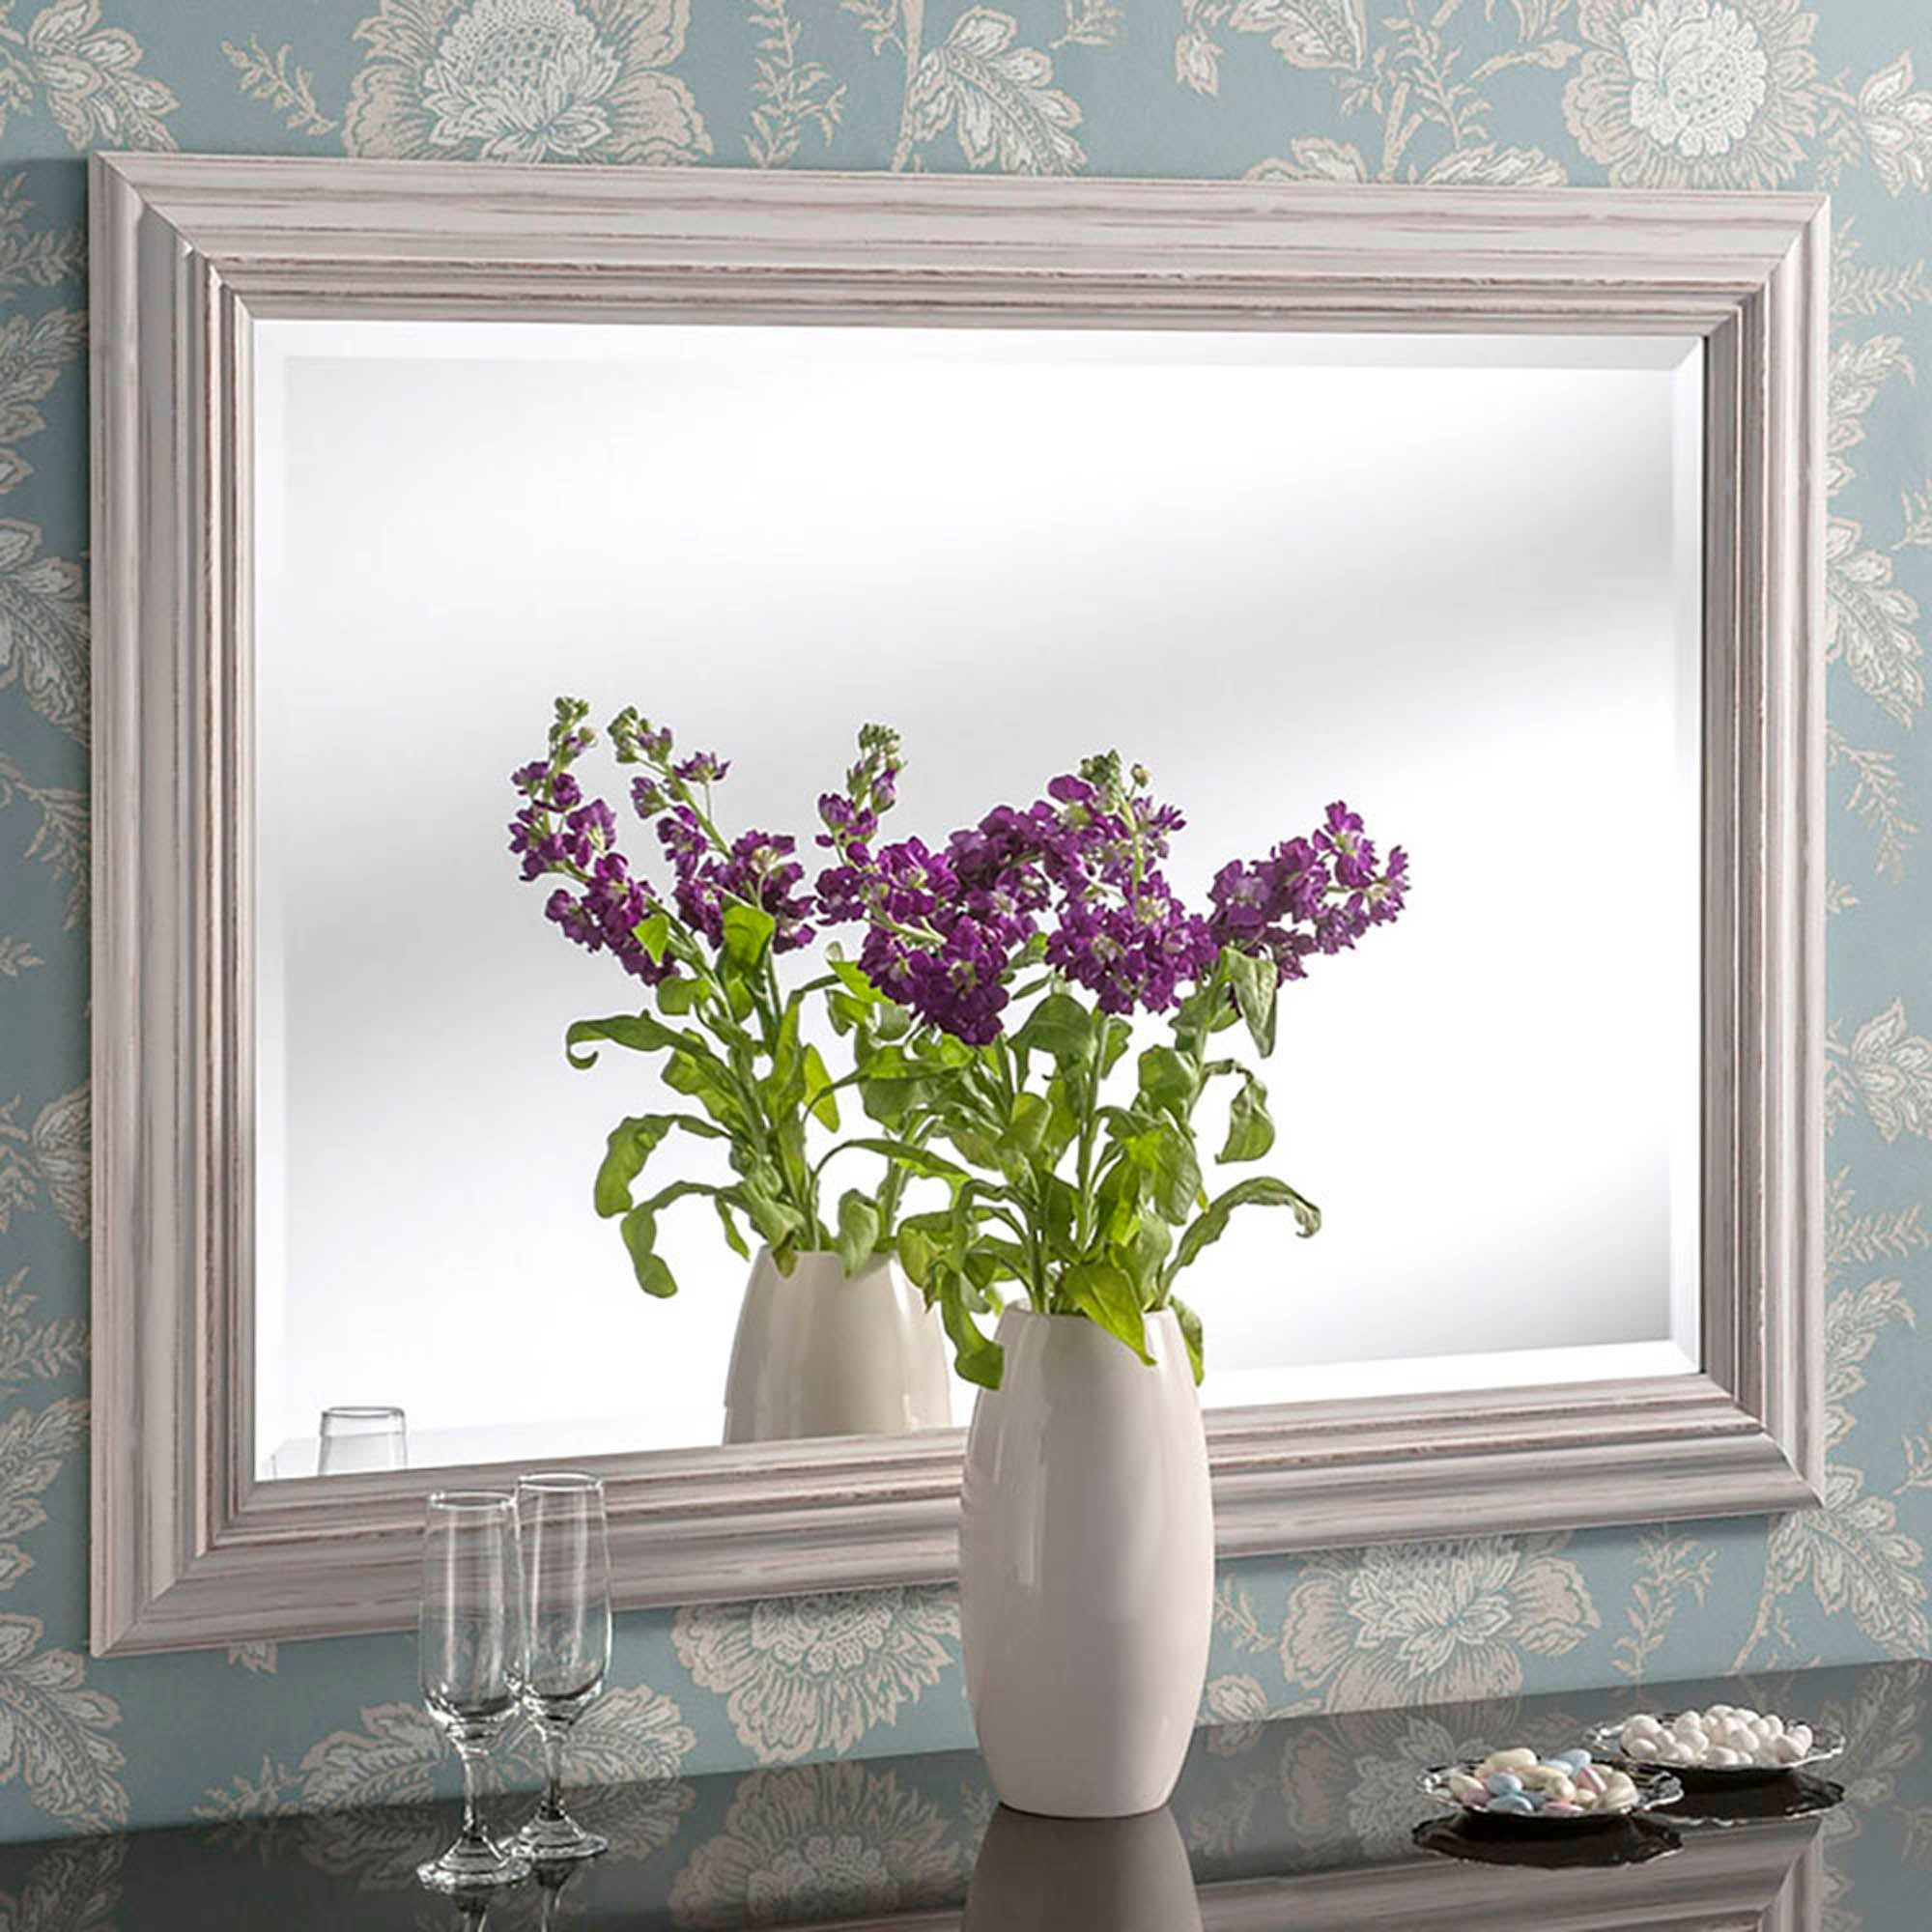 Yearn Framed Mirror Distressed White Mirror Wall Living Room Mirror Wall Bathroom Mirror Wall [ 2000 x 2000 Pixel ]